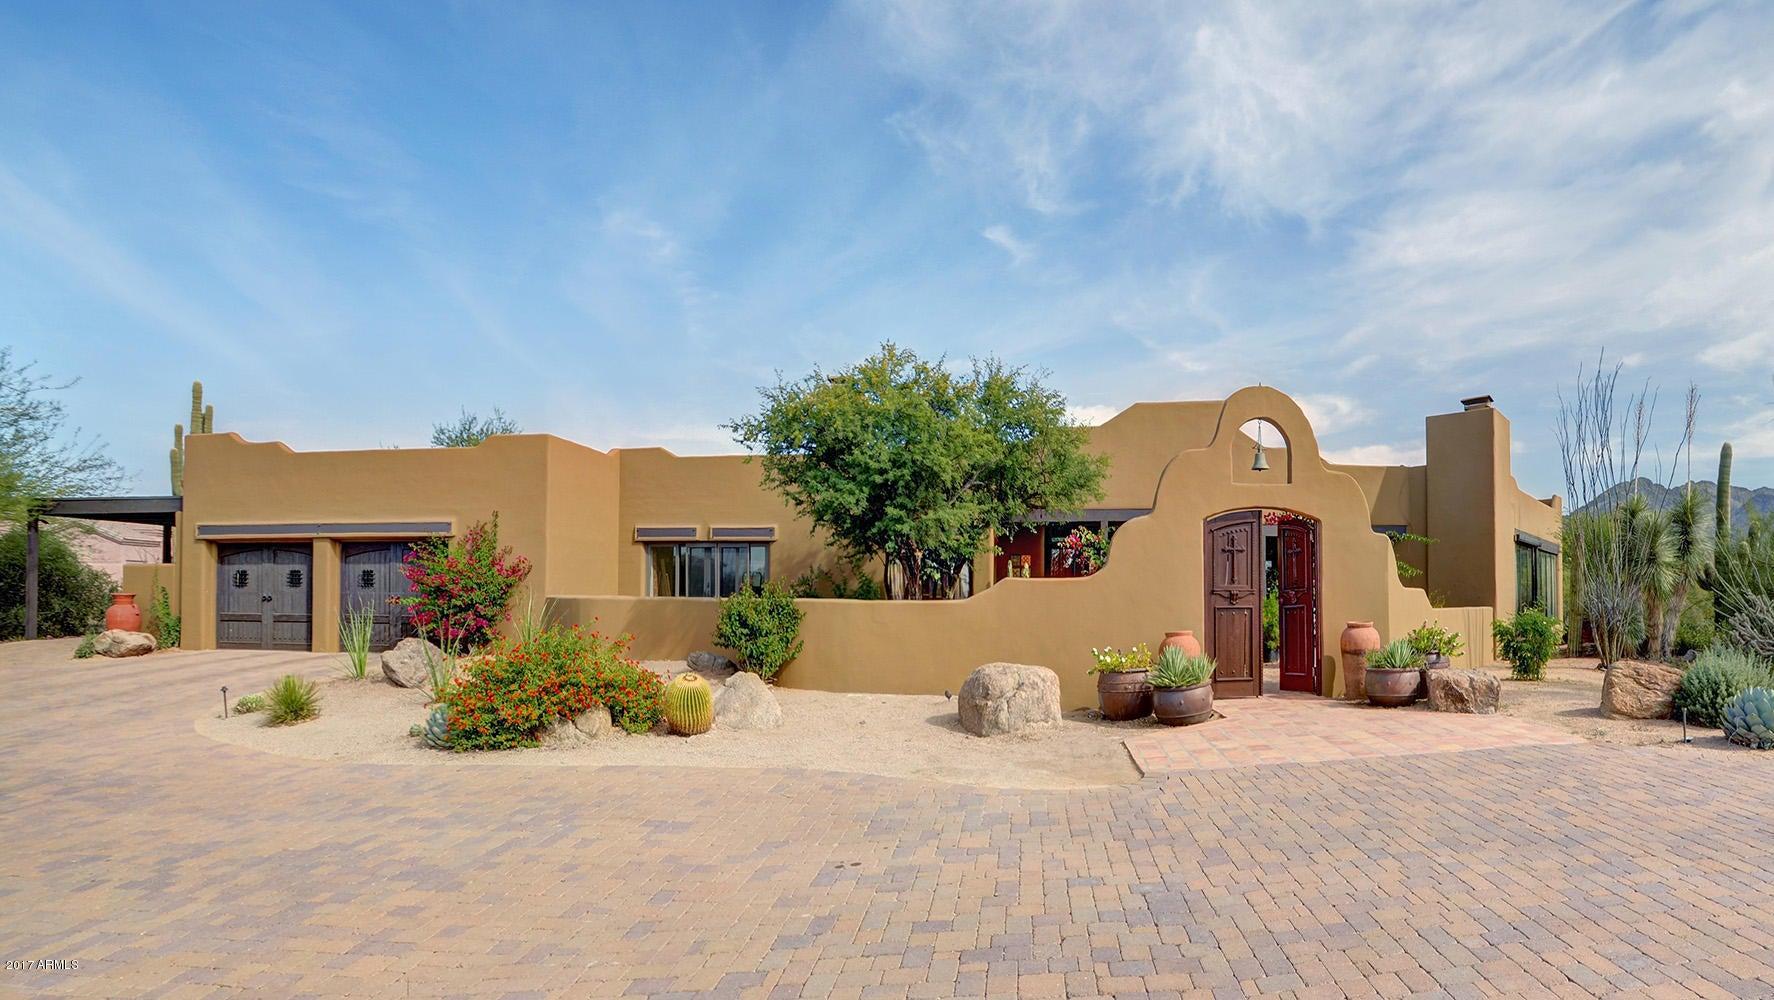 23225 N 95TH Street, Scottsdale AZ 85255